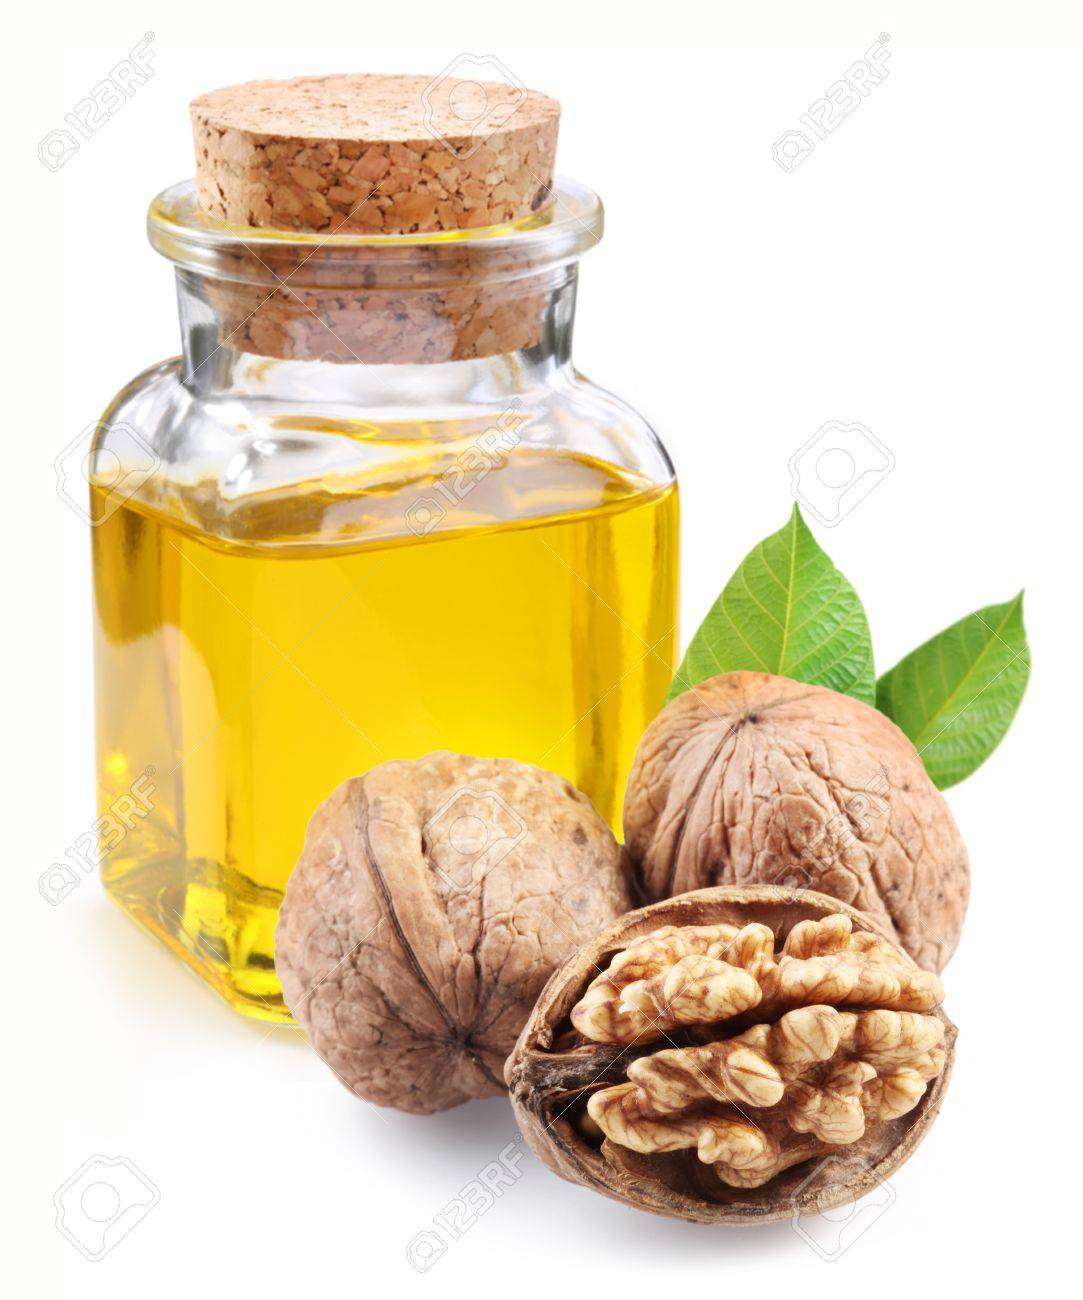 Сделать масло грецкого ореха домашних условиях